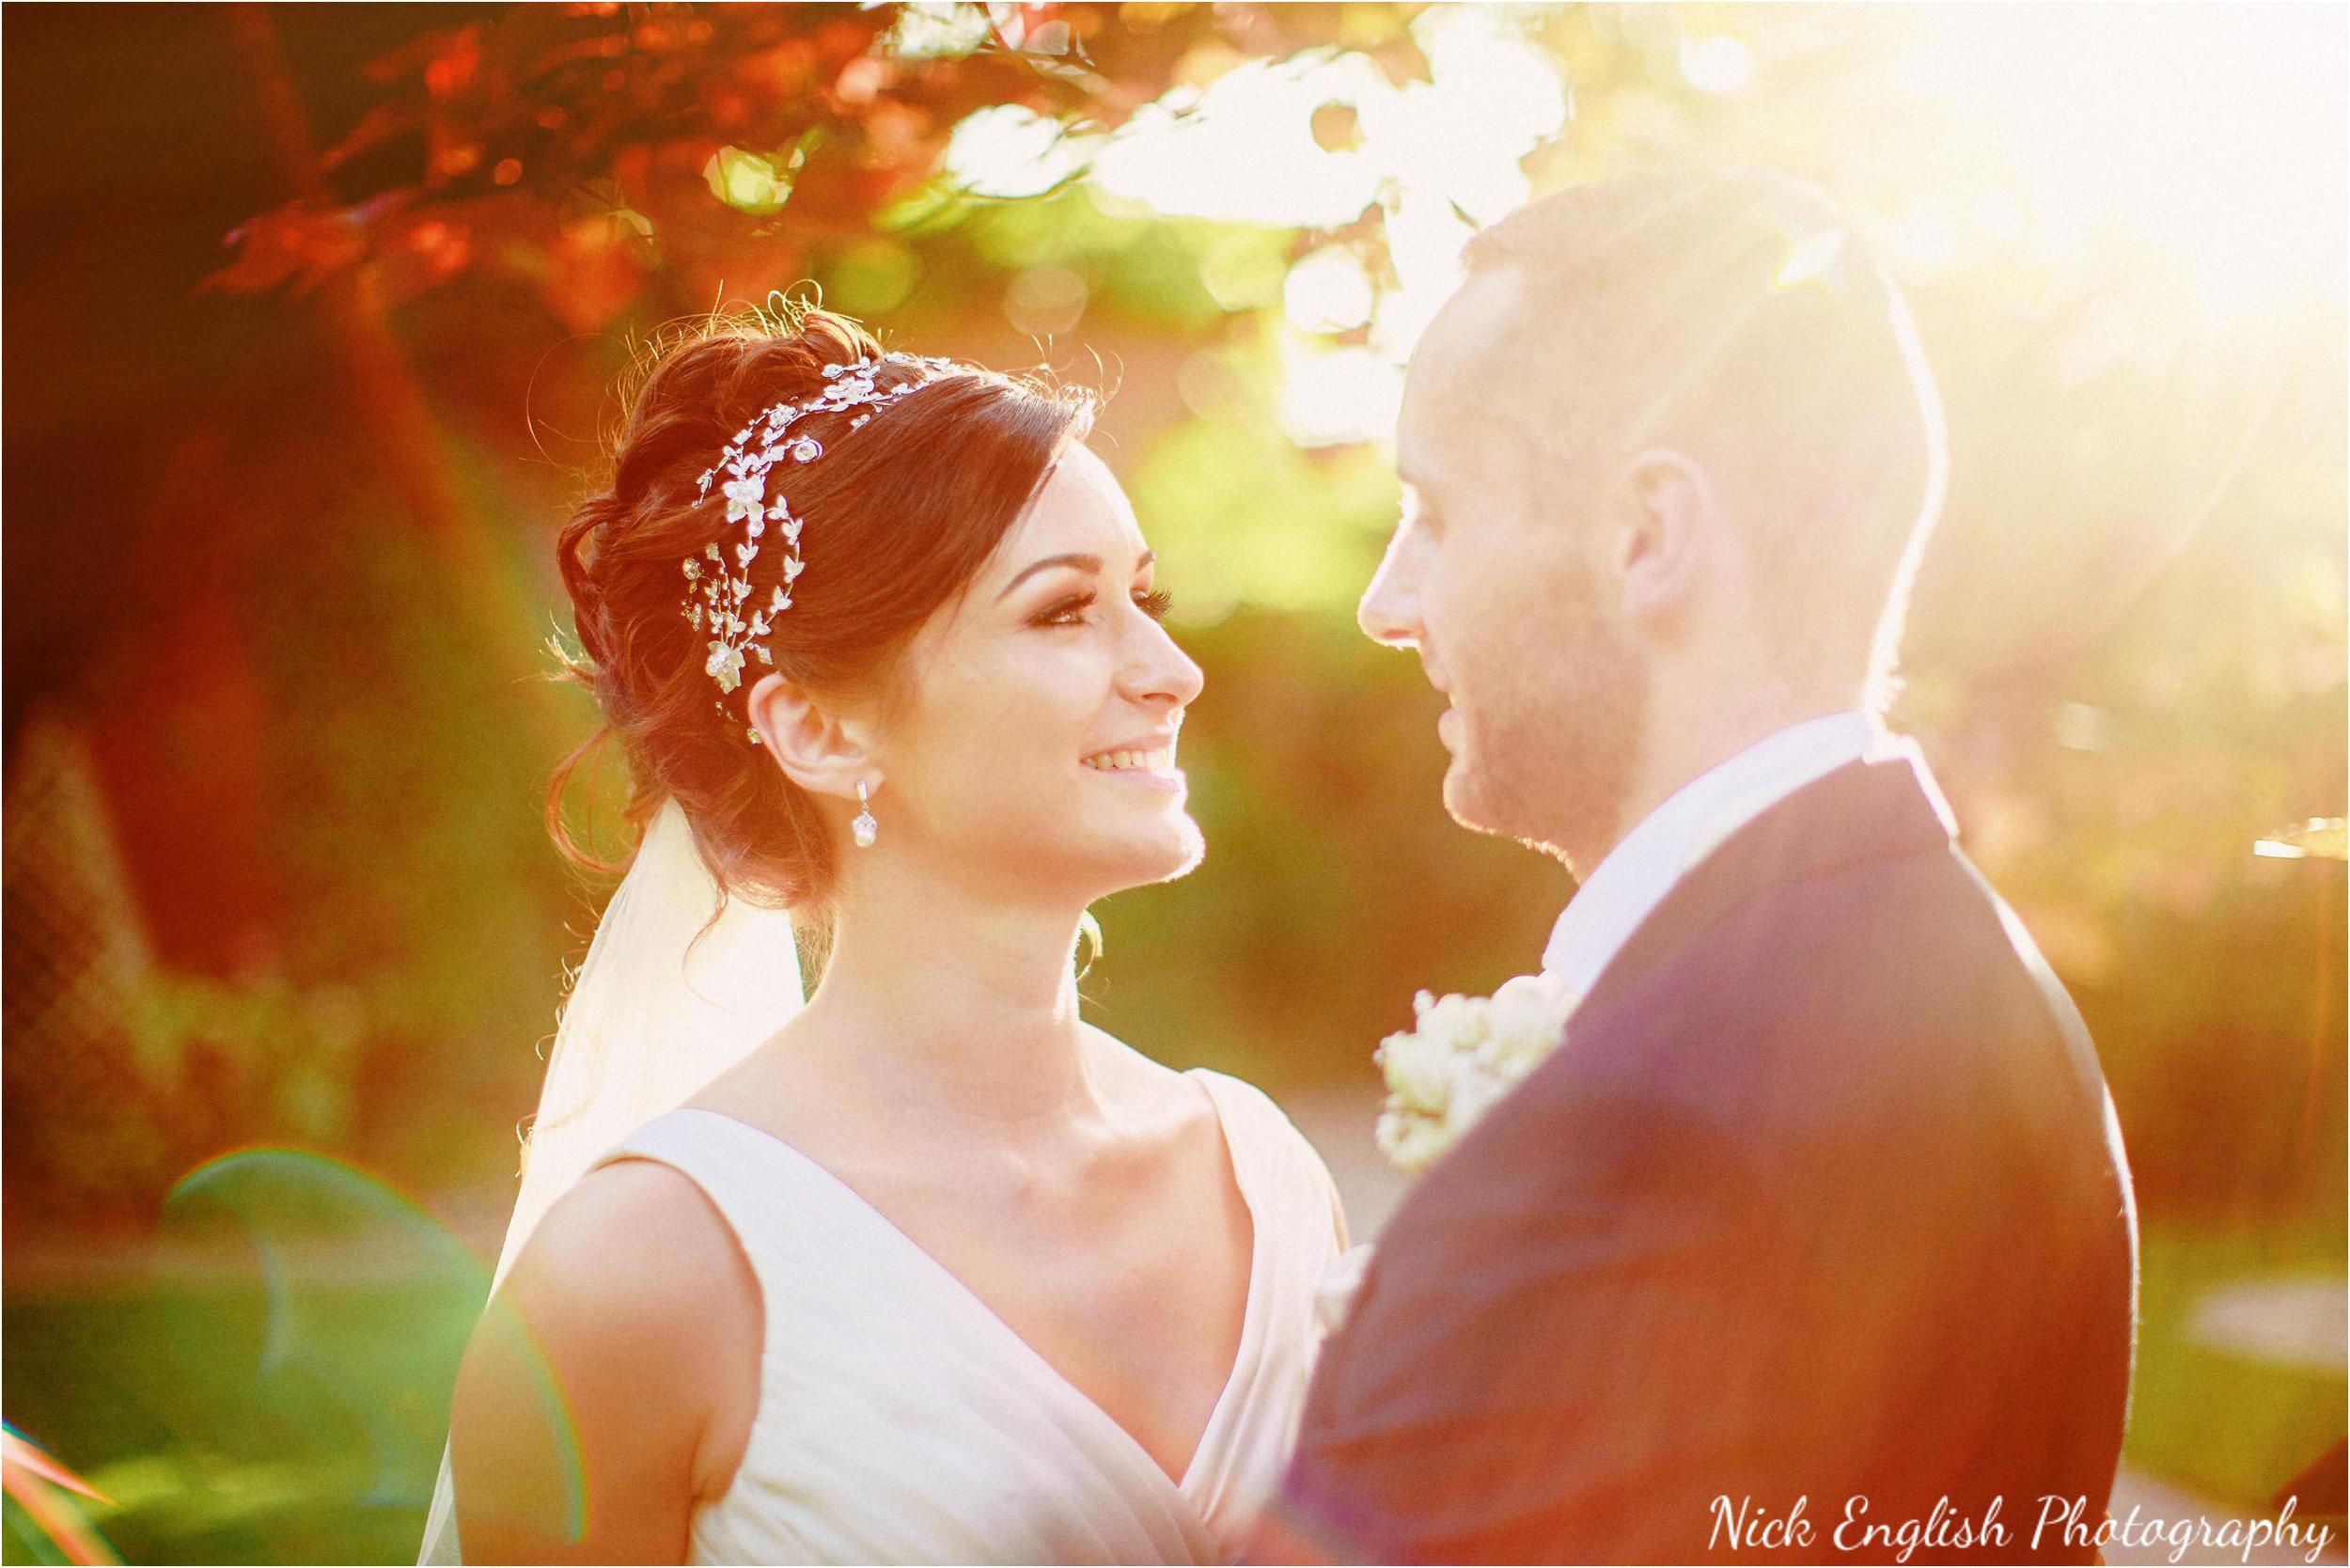 Emily David Wedding Photographs at Barton Grange Preston by Nick English Photography 196jpg.jpeg